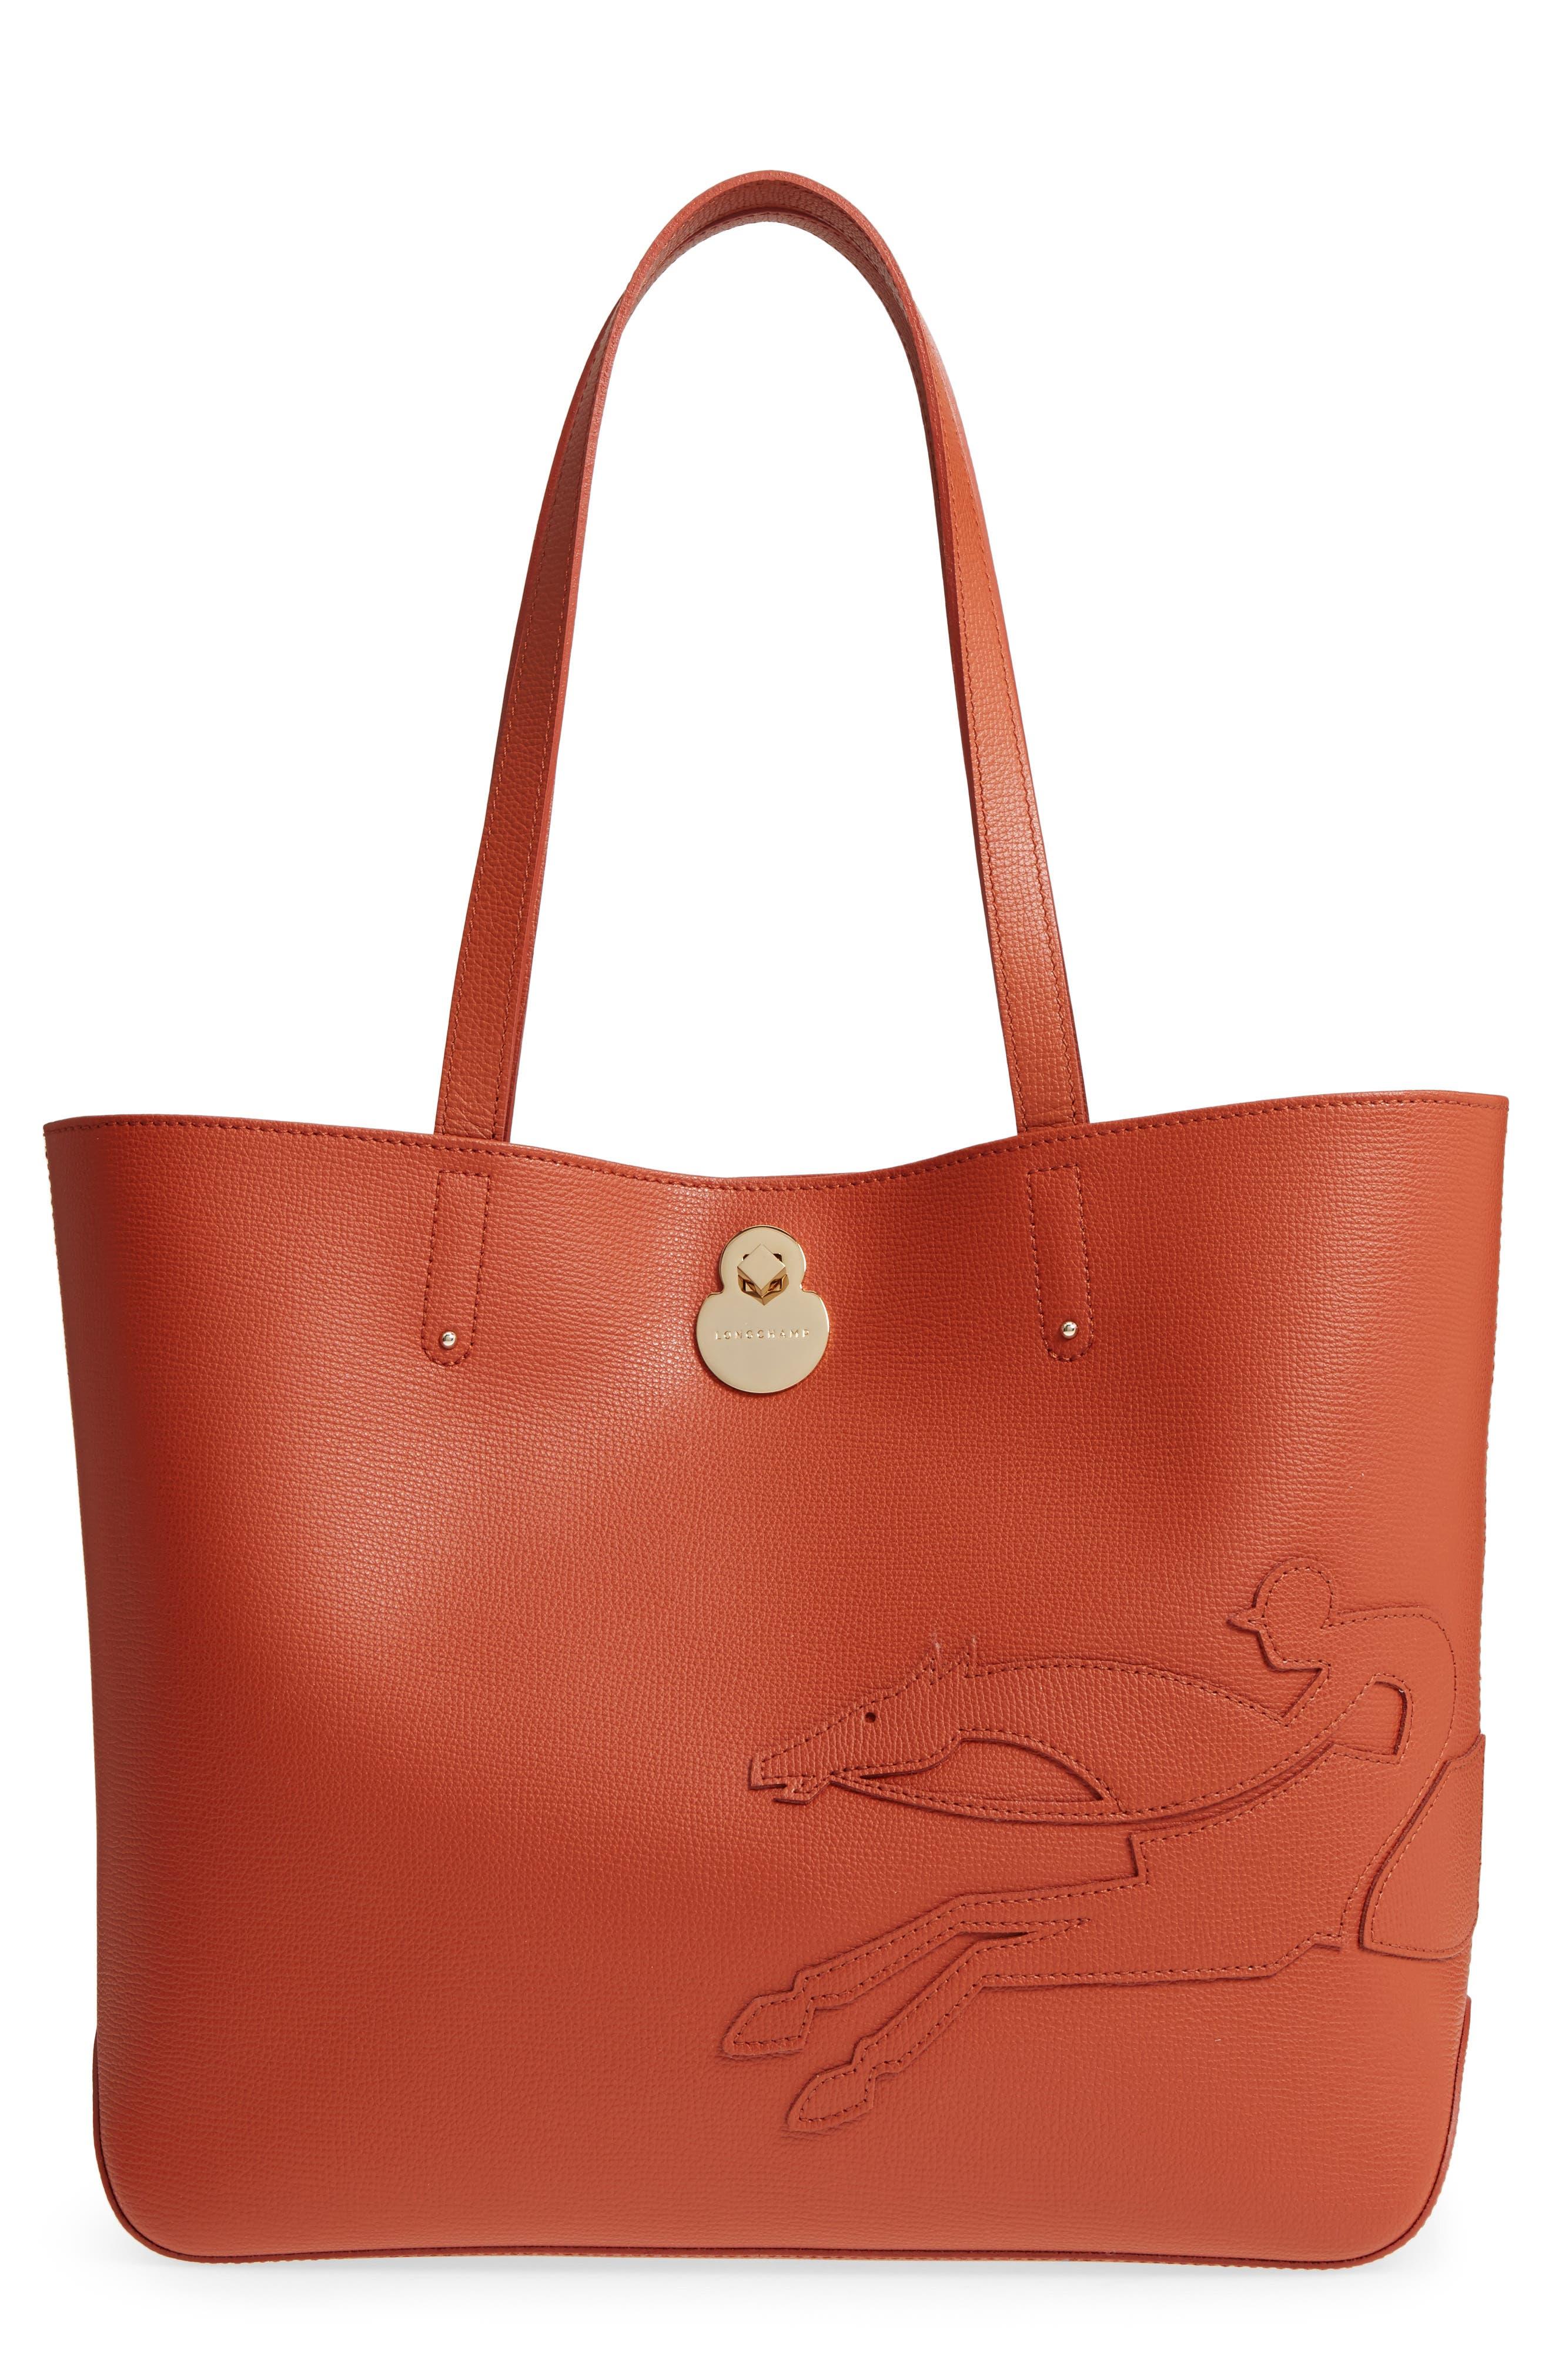 Longchamp Medium Shop-It Leather Tote